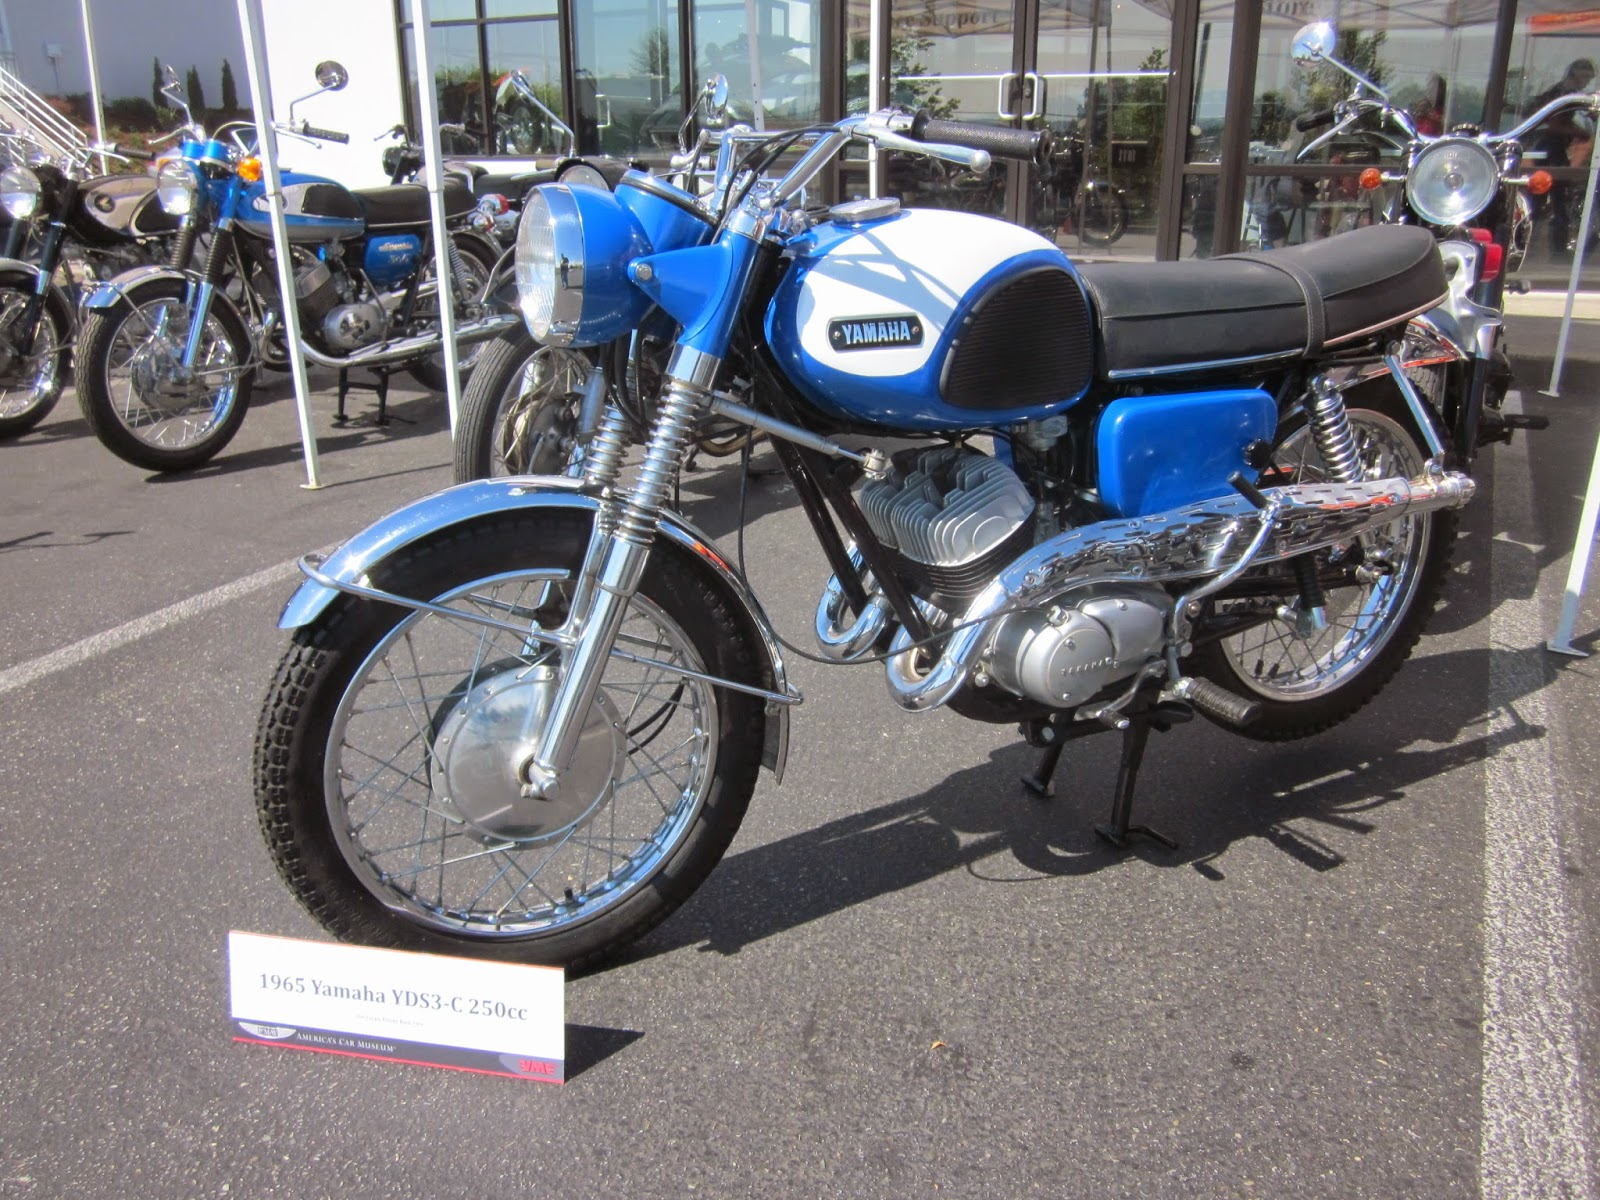 oldmotodude: 1965 yamaha yds3-c 250 on display at the 2014 vjmc